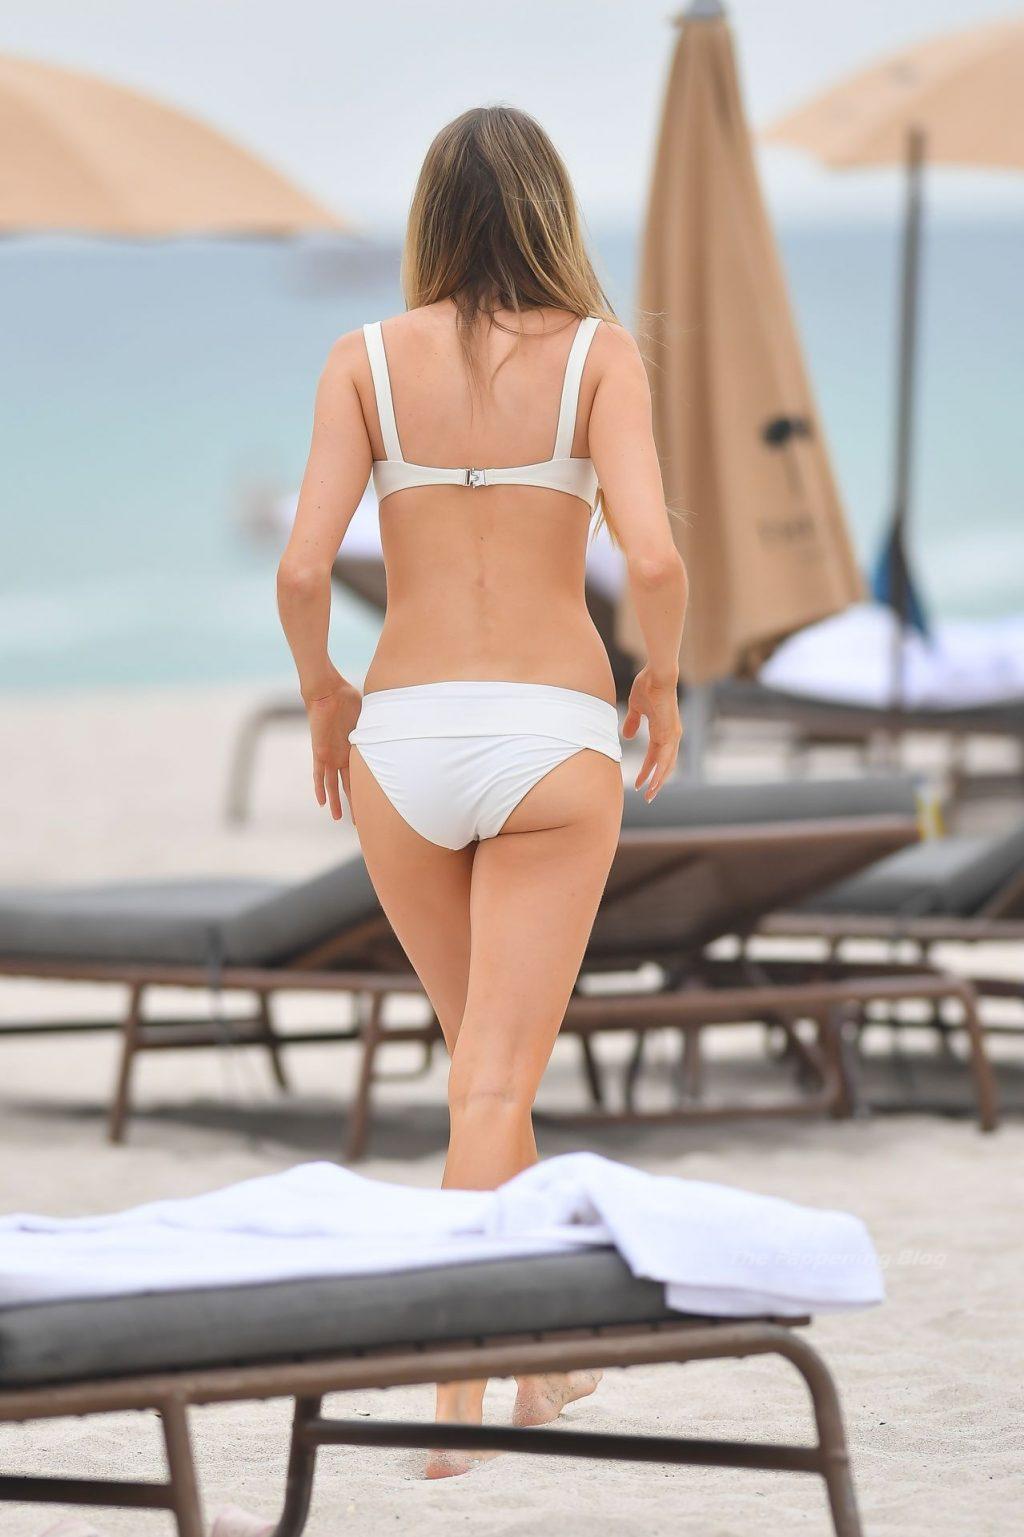 Louisa Warwick Flaunts Her Sexy Body in a White Bikini in Miami Beach (36 Photos)